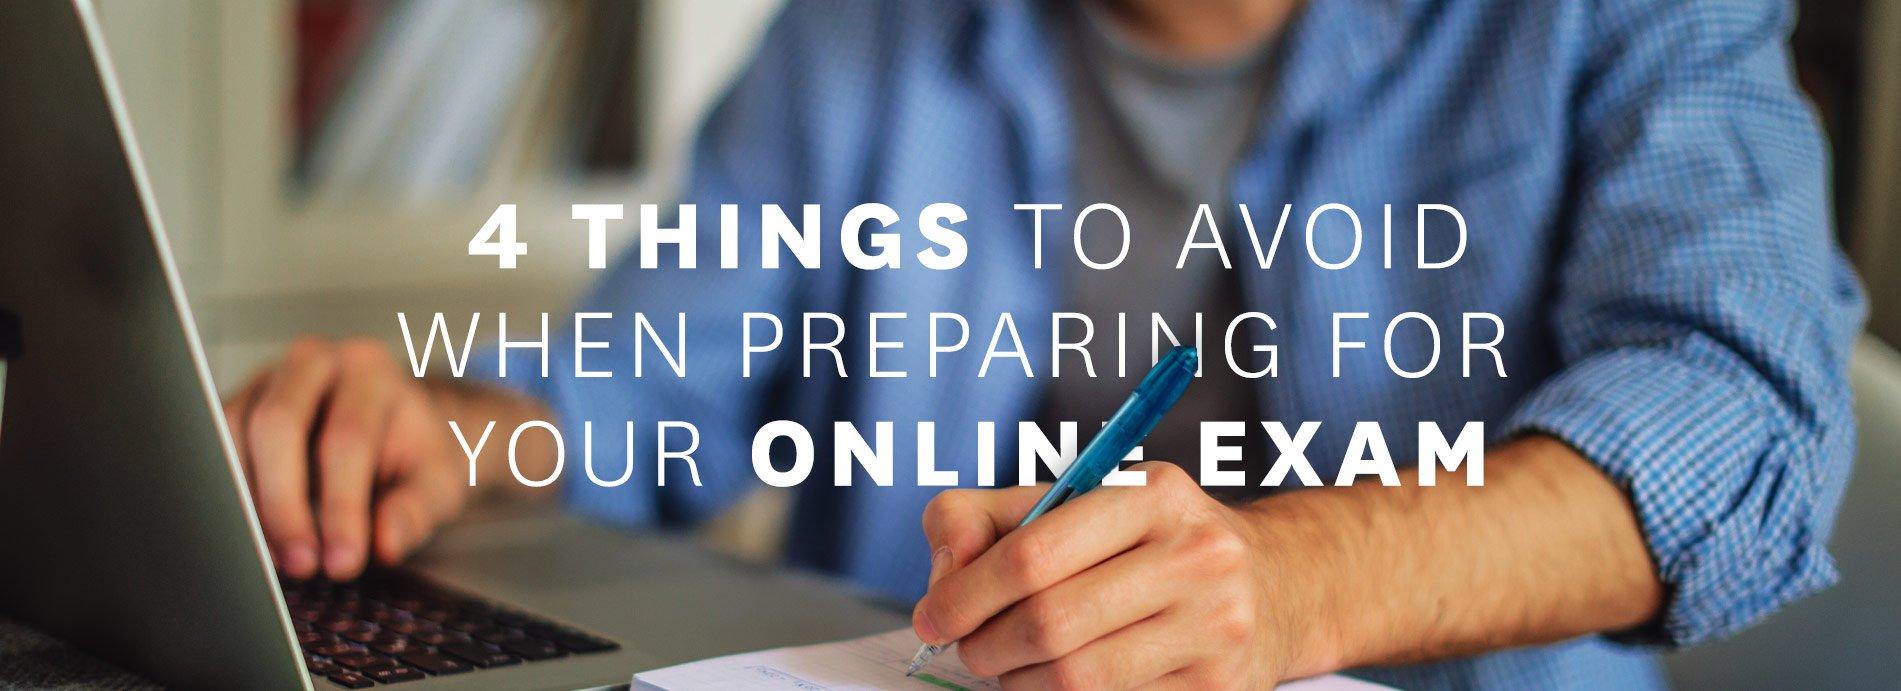 online-exams-blog (1)